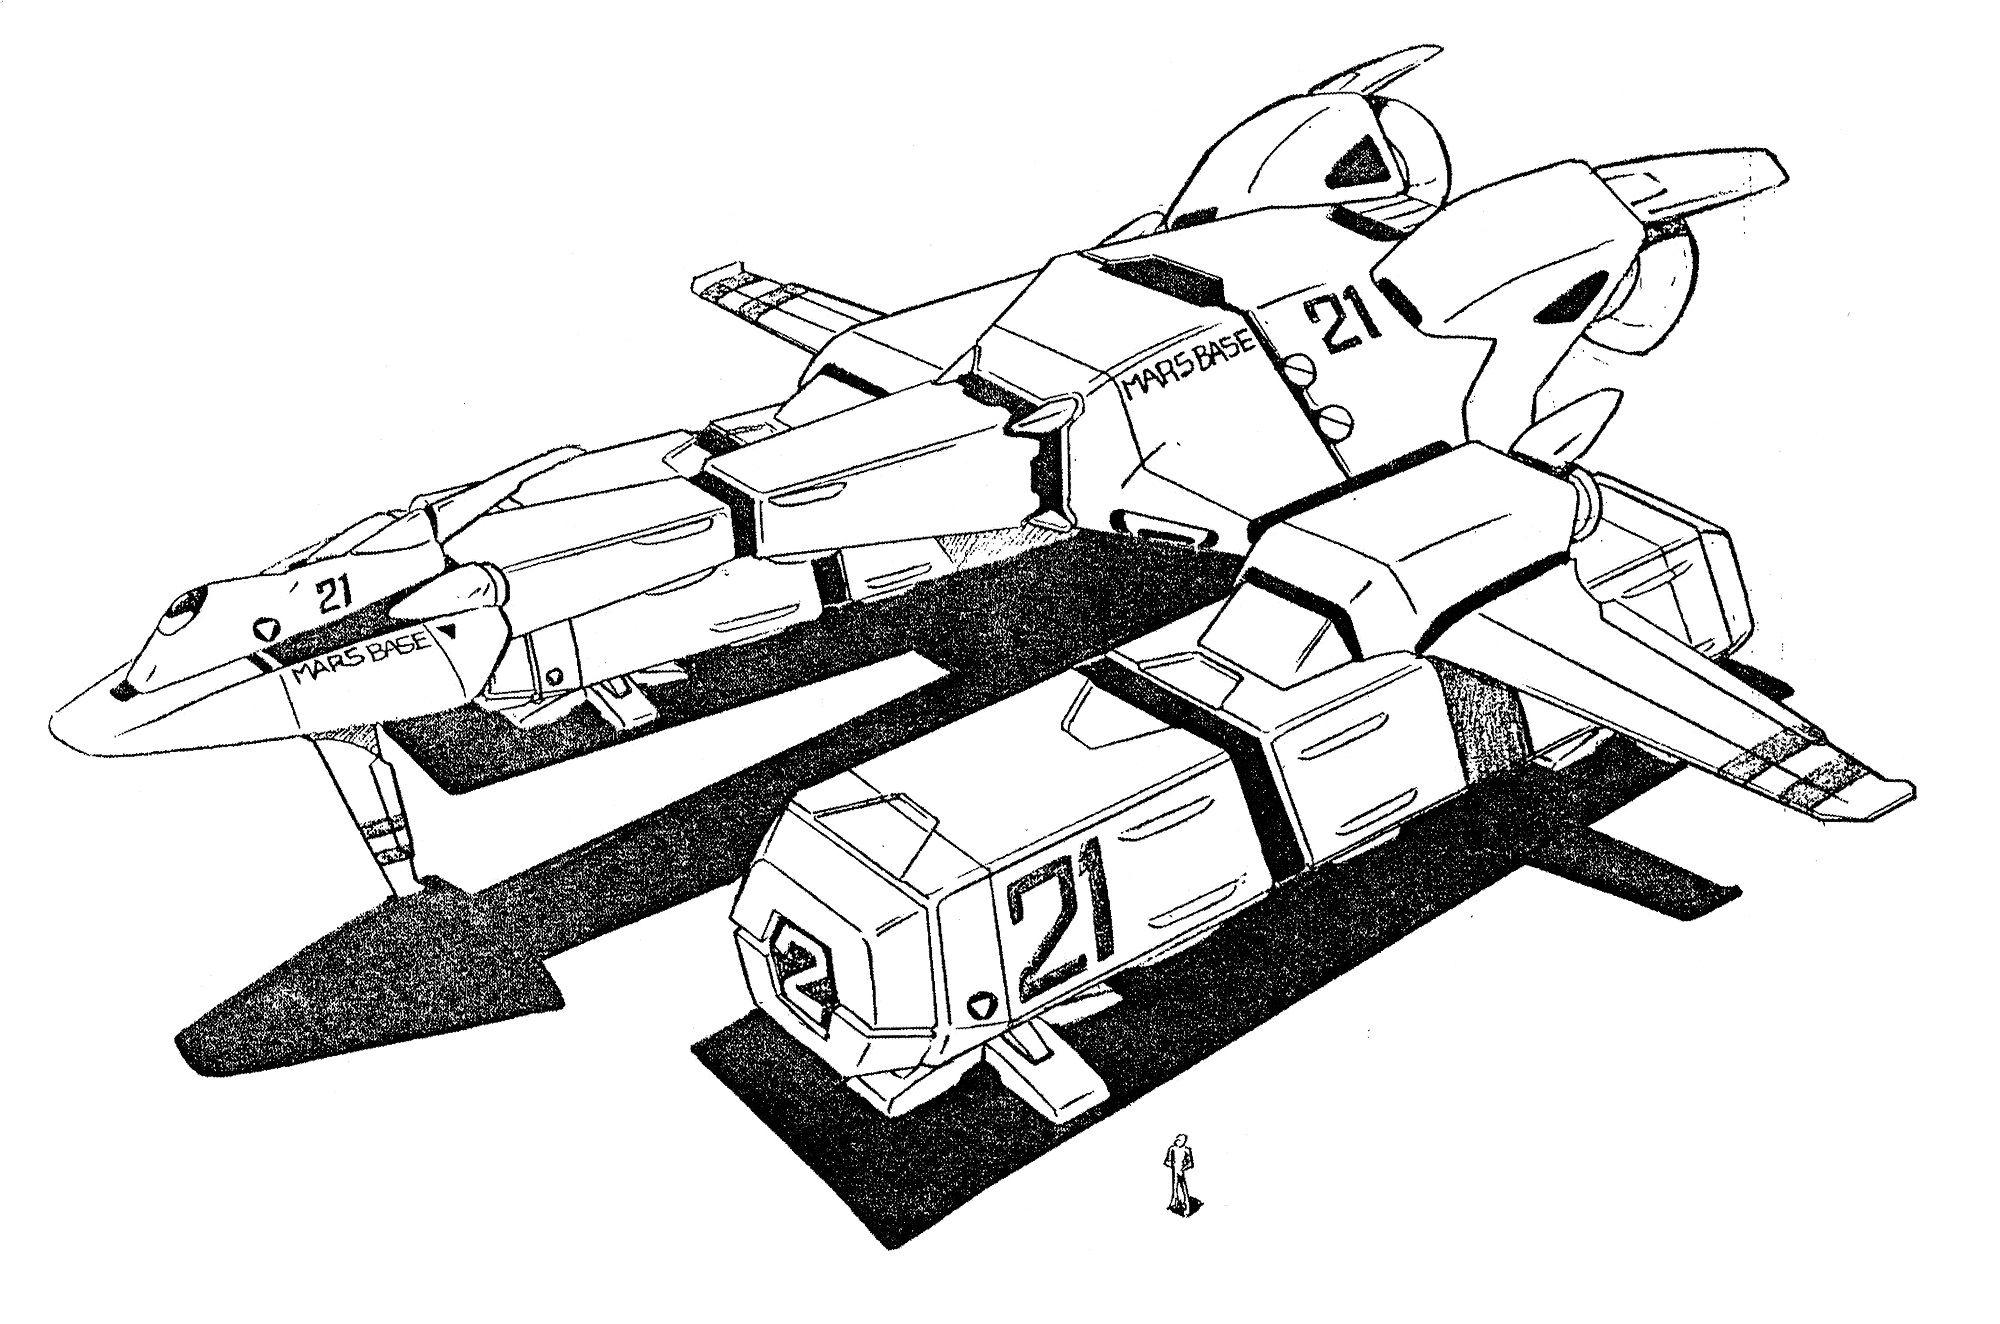 Lca 12 Horizont Cargo Dropship Aerospacecraft 02